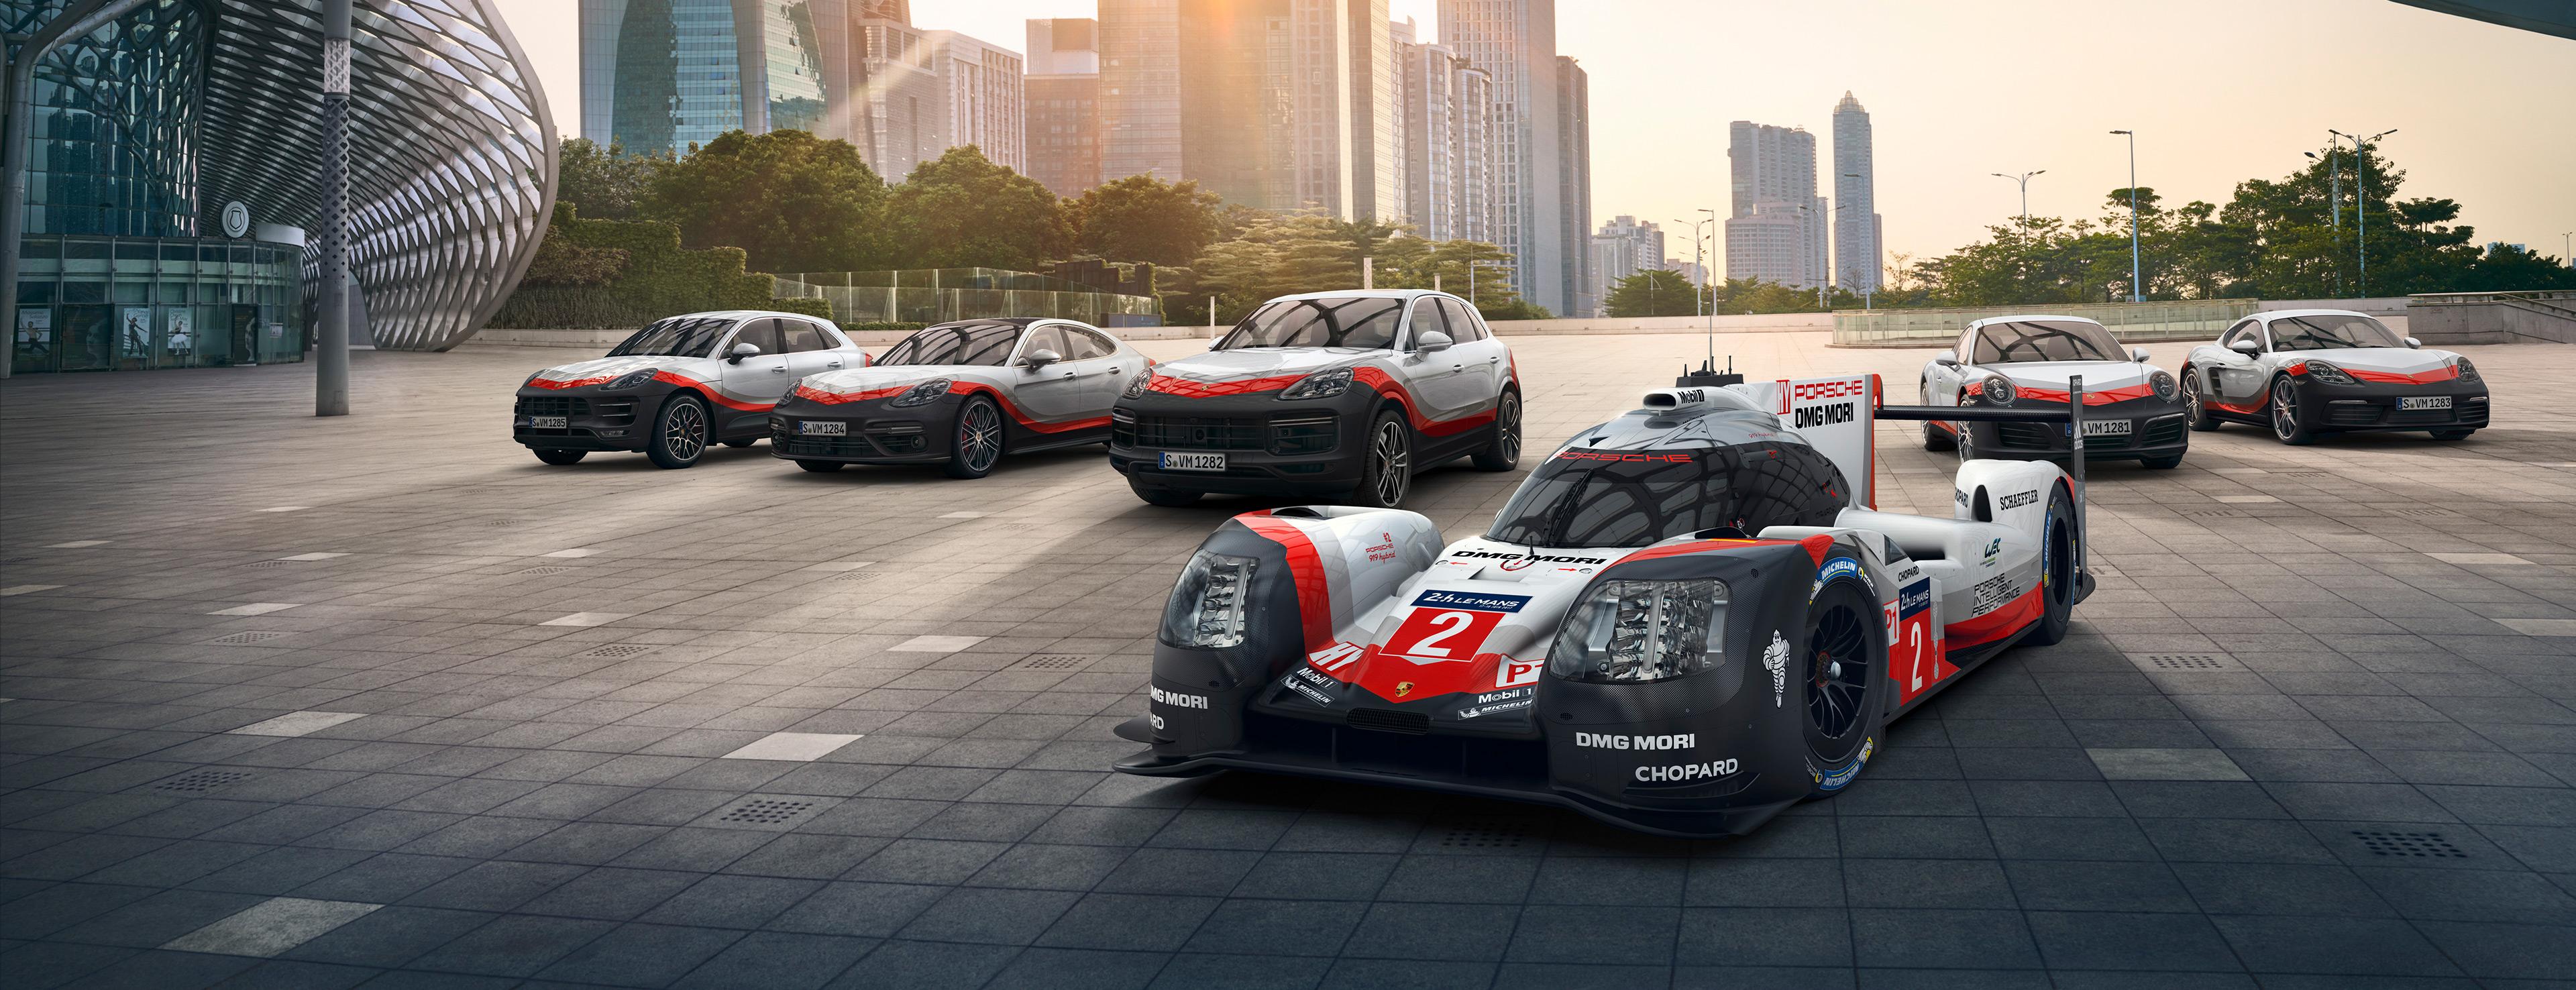 Porsche - Automovilismo